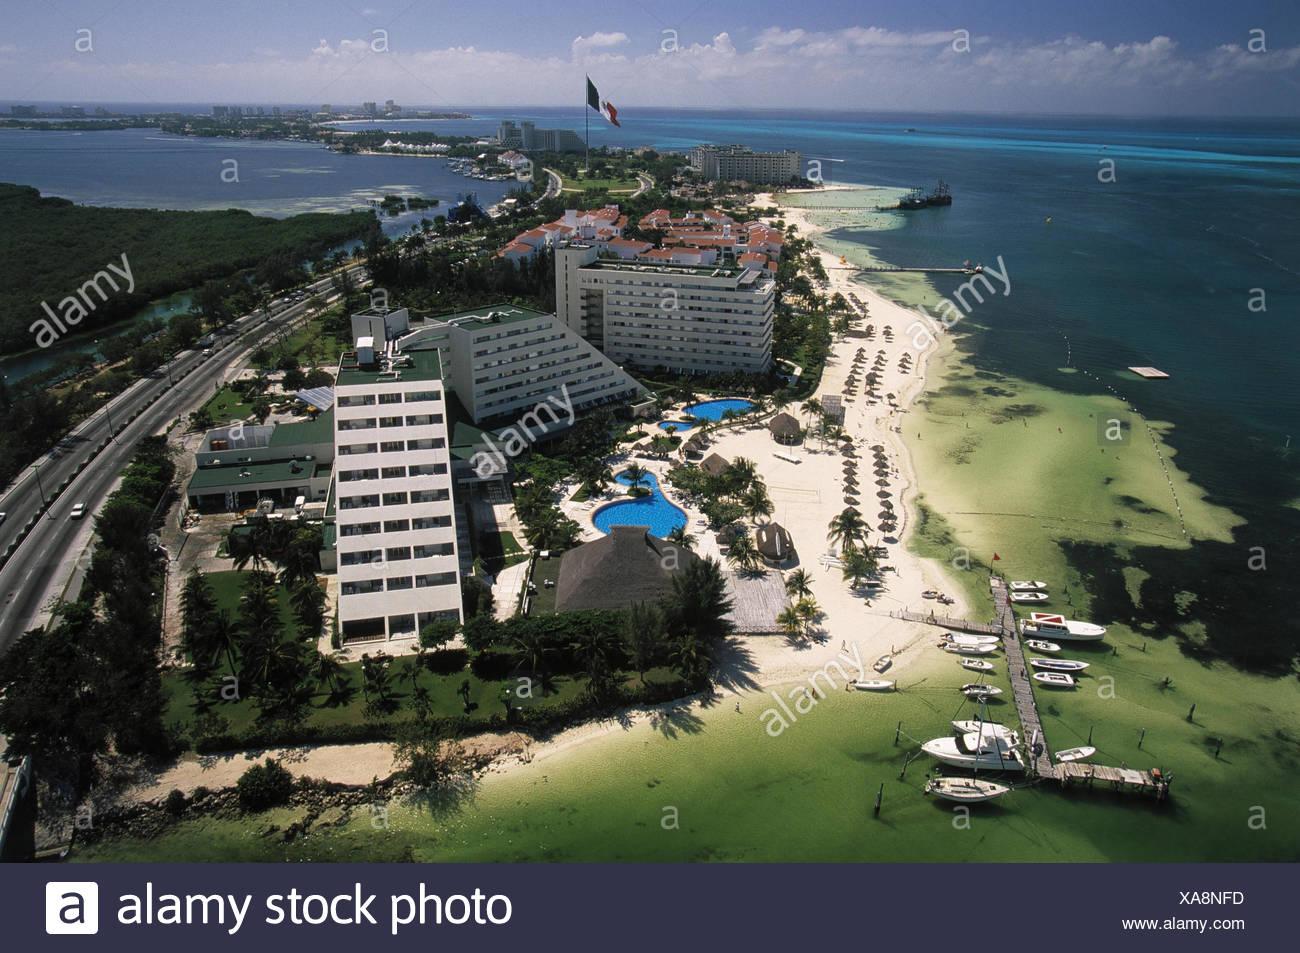 Mexiko, Quintana Roo, Cancun,  Stadtübersicht, Playa Langosta, Bahia de Mujeres Mittelamerika, Stadt, Hochhäuser, Wolkenkratzer, Hotels, Badestrand, Strand, Meer, Sommer - Stock Image